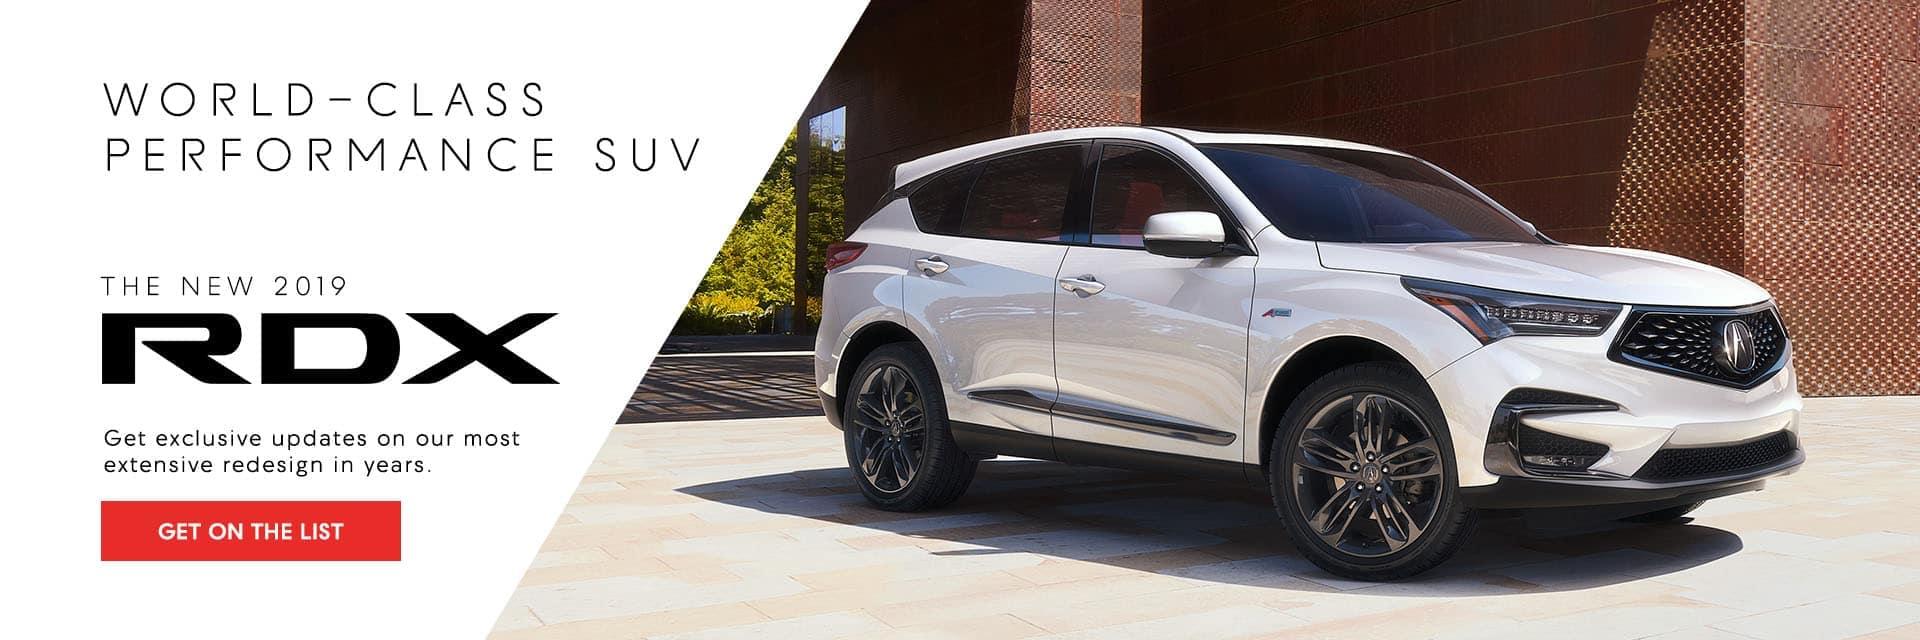 2019 Acura RDX Get on the List Banner